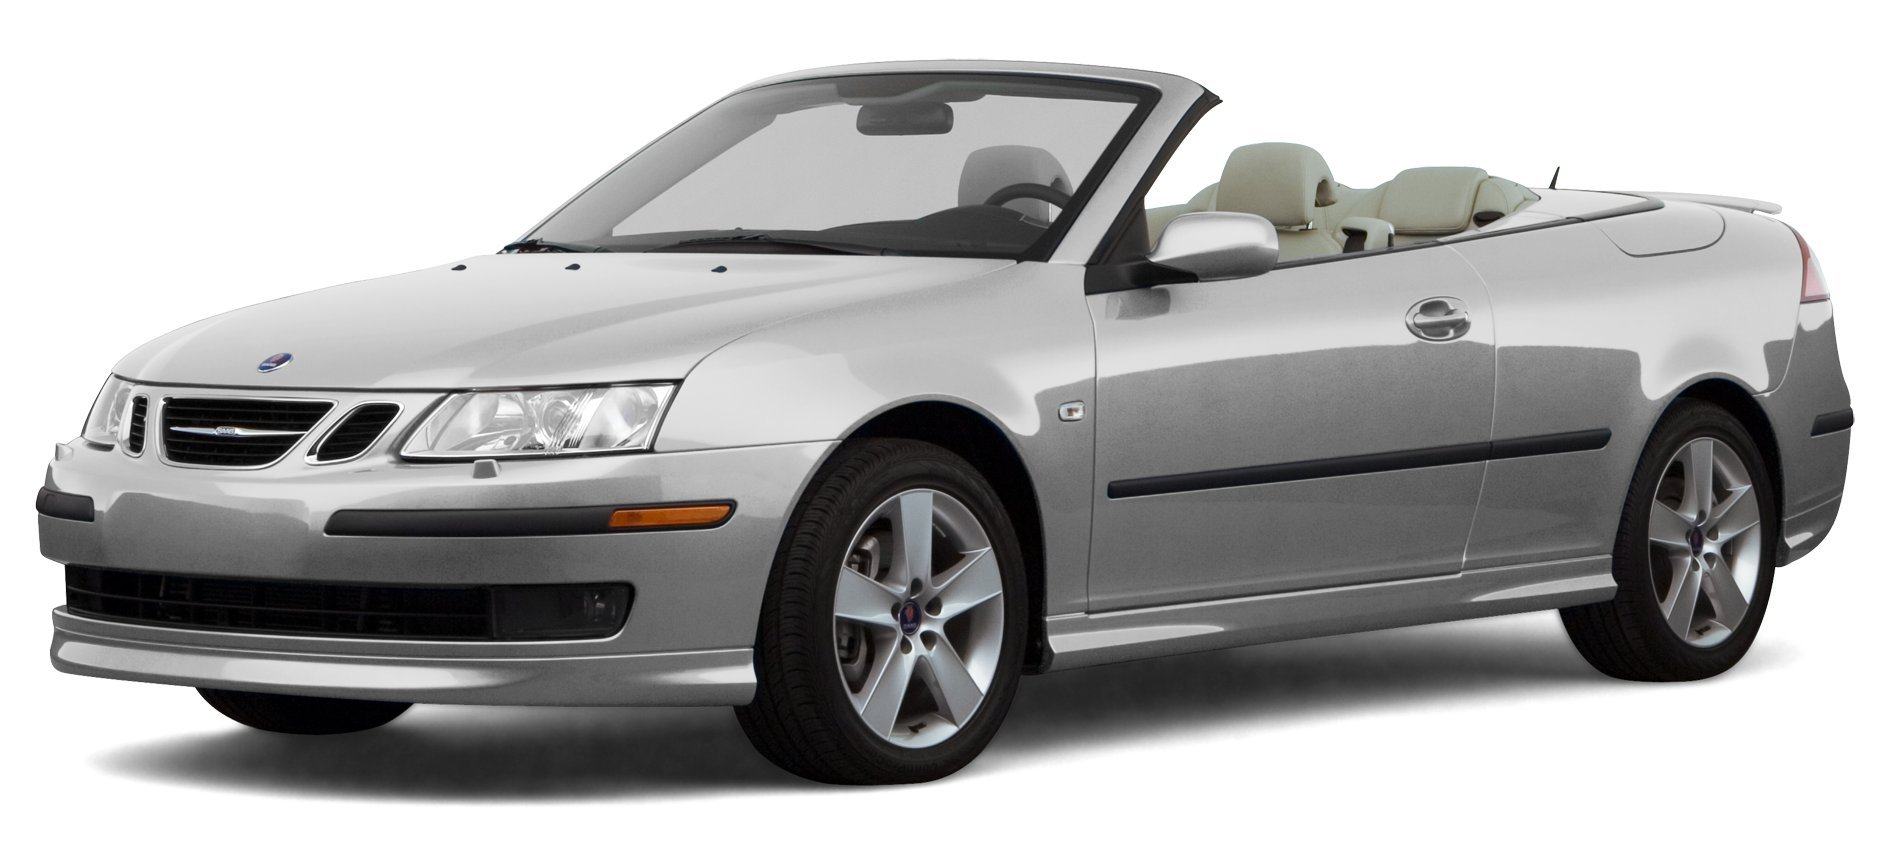 ... 2007 Saab 9-3, 2-Door Convertible Automatic Transmission ...